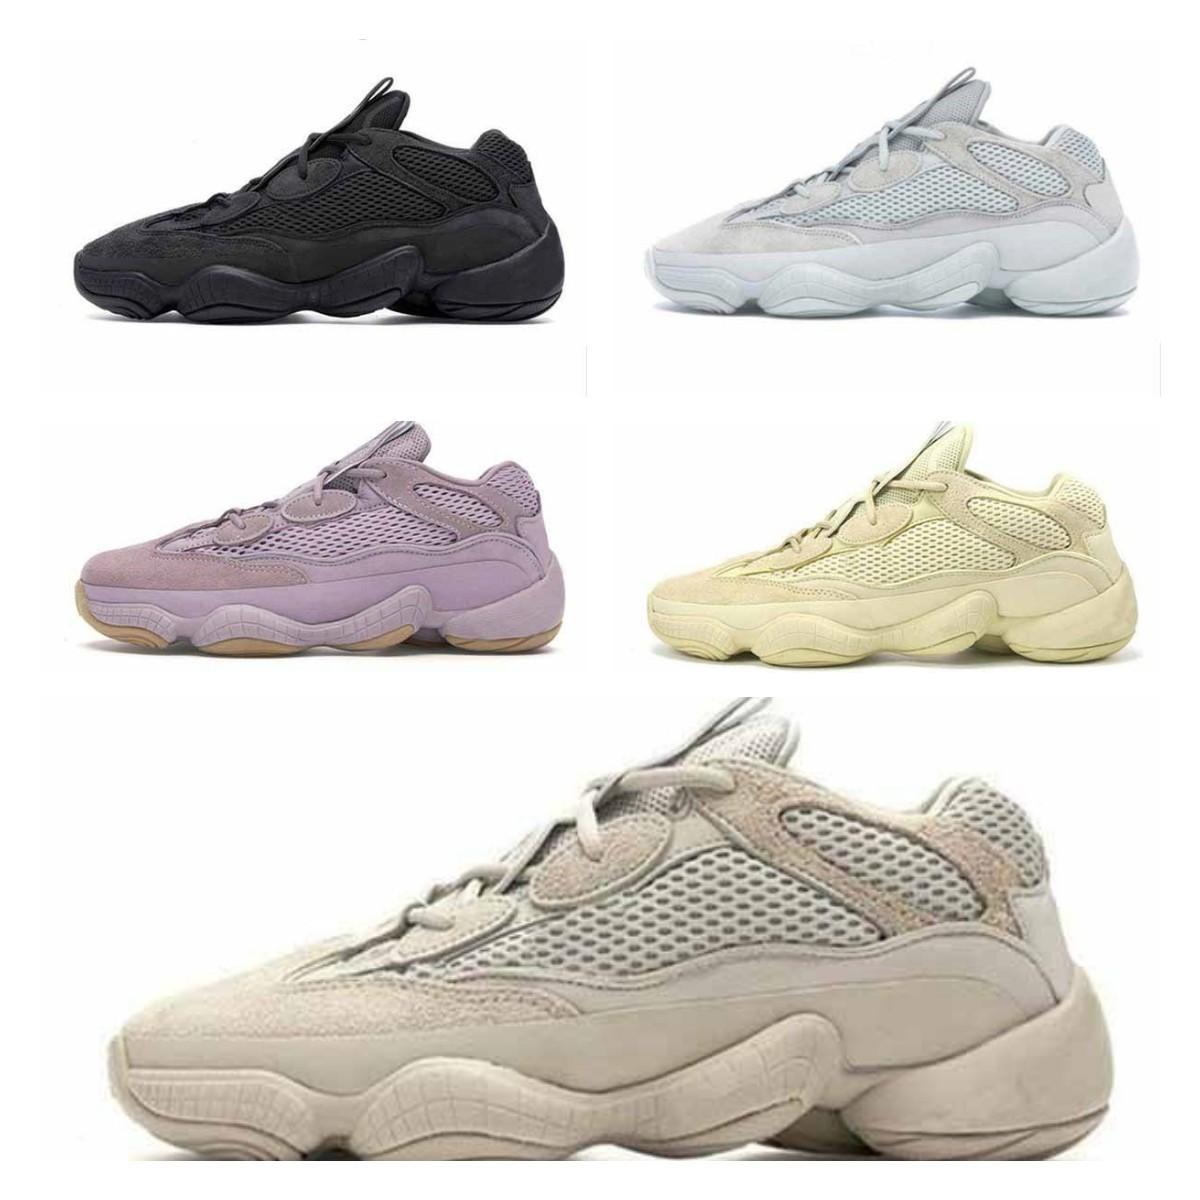 Adidas Yeezy Boost 500 shoes [شحنها في غضون 6 أيام] الصحراء الفئران 500 الرؤية العظام الأبيض الاحذية رجل إمرأة القمر الأصفر كاني ويست الرياضة أحذية رياضية الأحذية 9 #